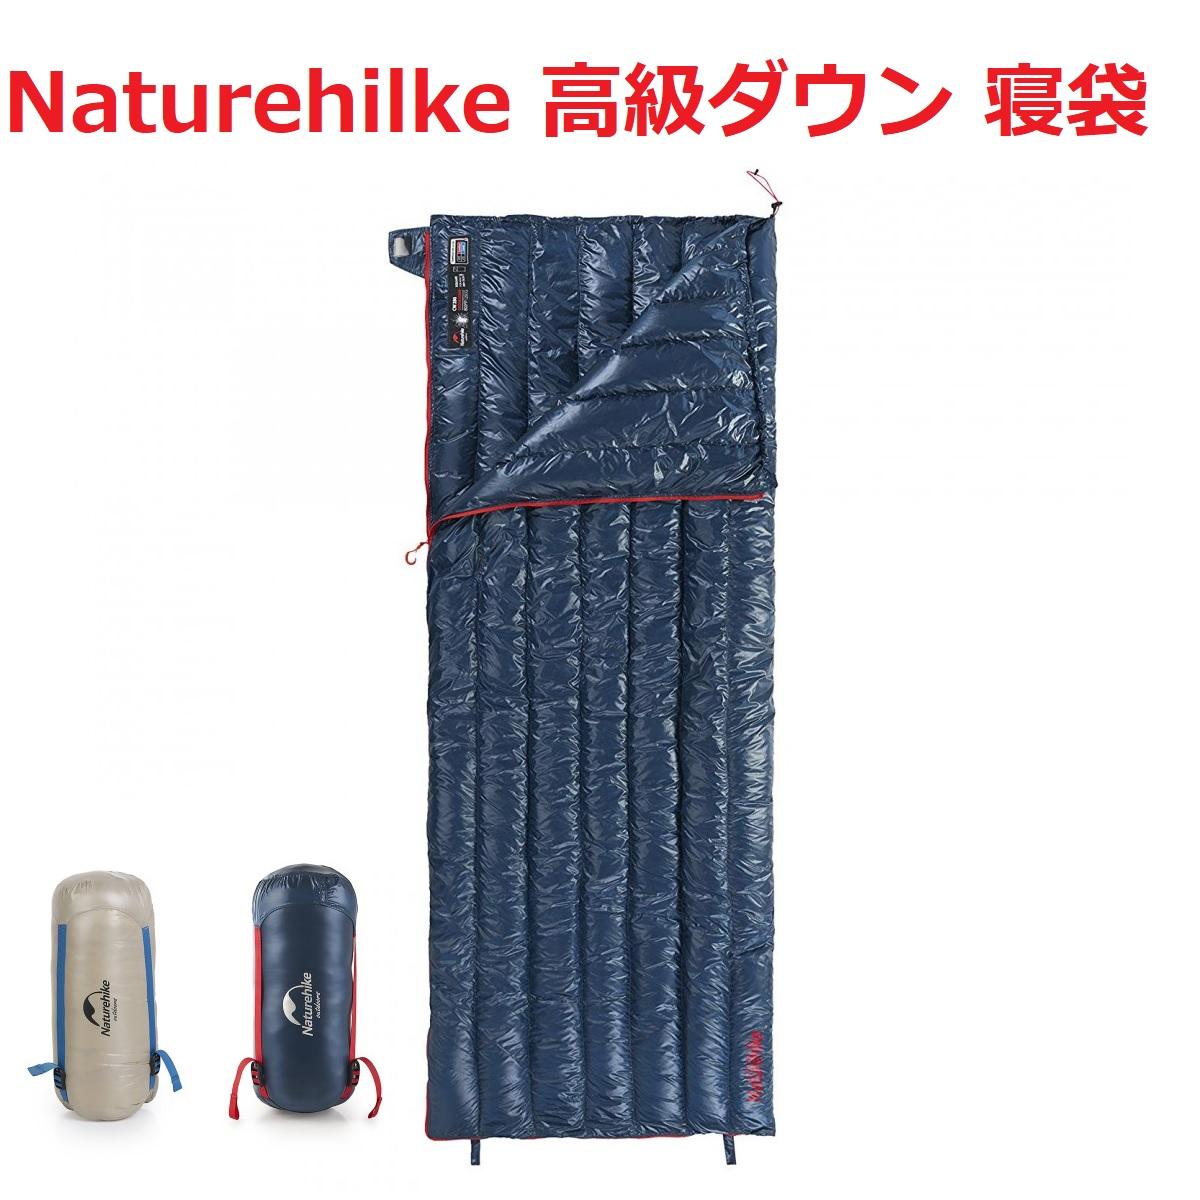 Naturehike ネイチャーハイク シュラフ 寝袋 シュラフ 高級 ダウン コンパクト 車中泊 夏用 洗える